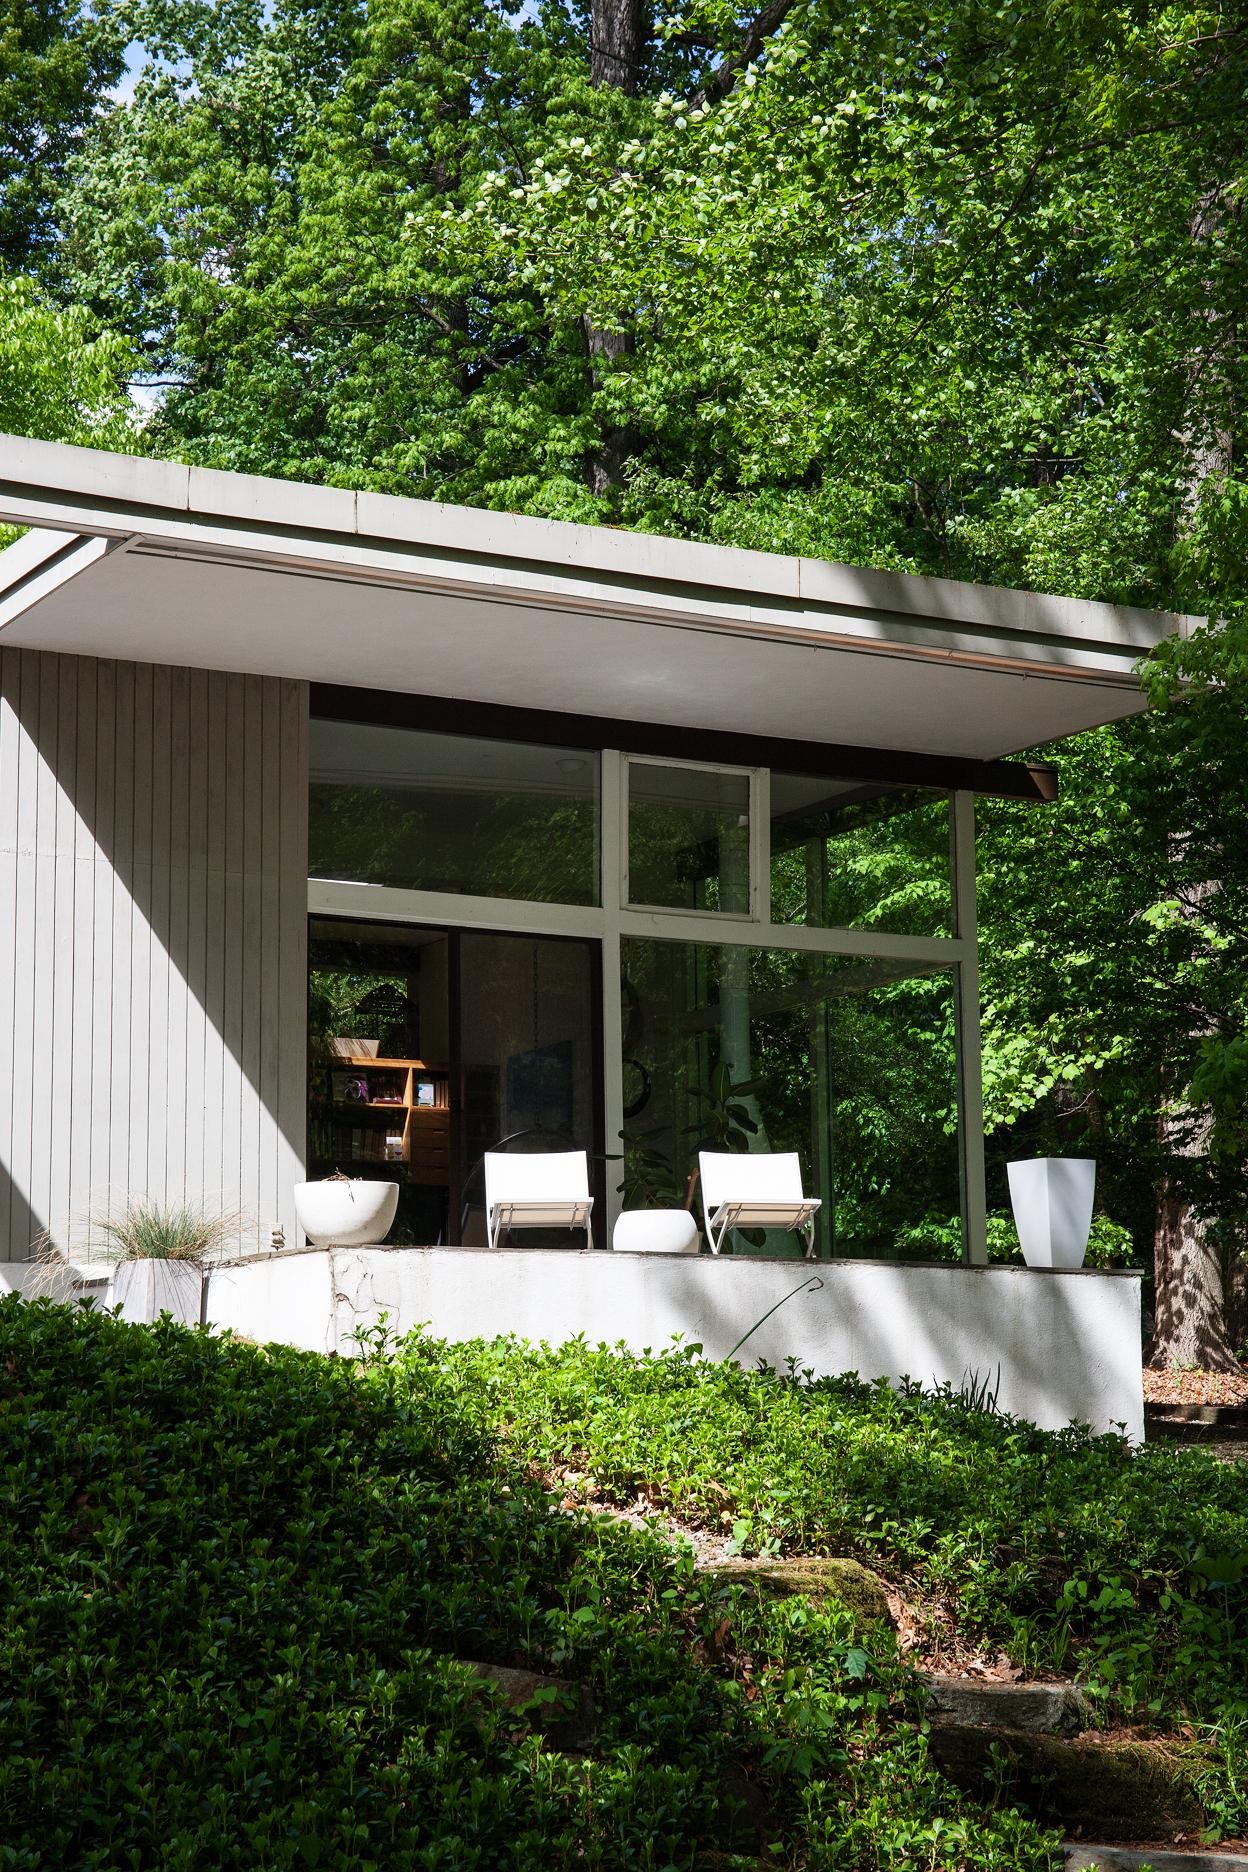 richard neutra house in pennsylvania gets a sensitive modern